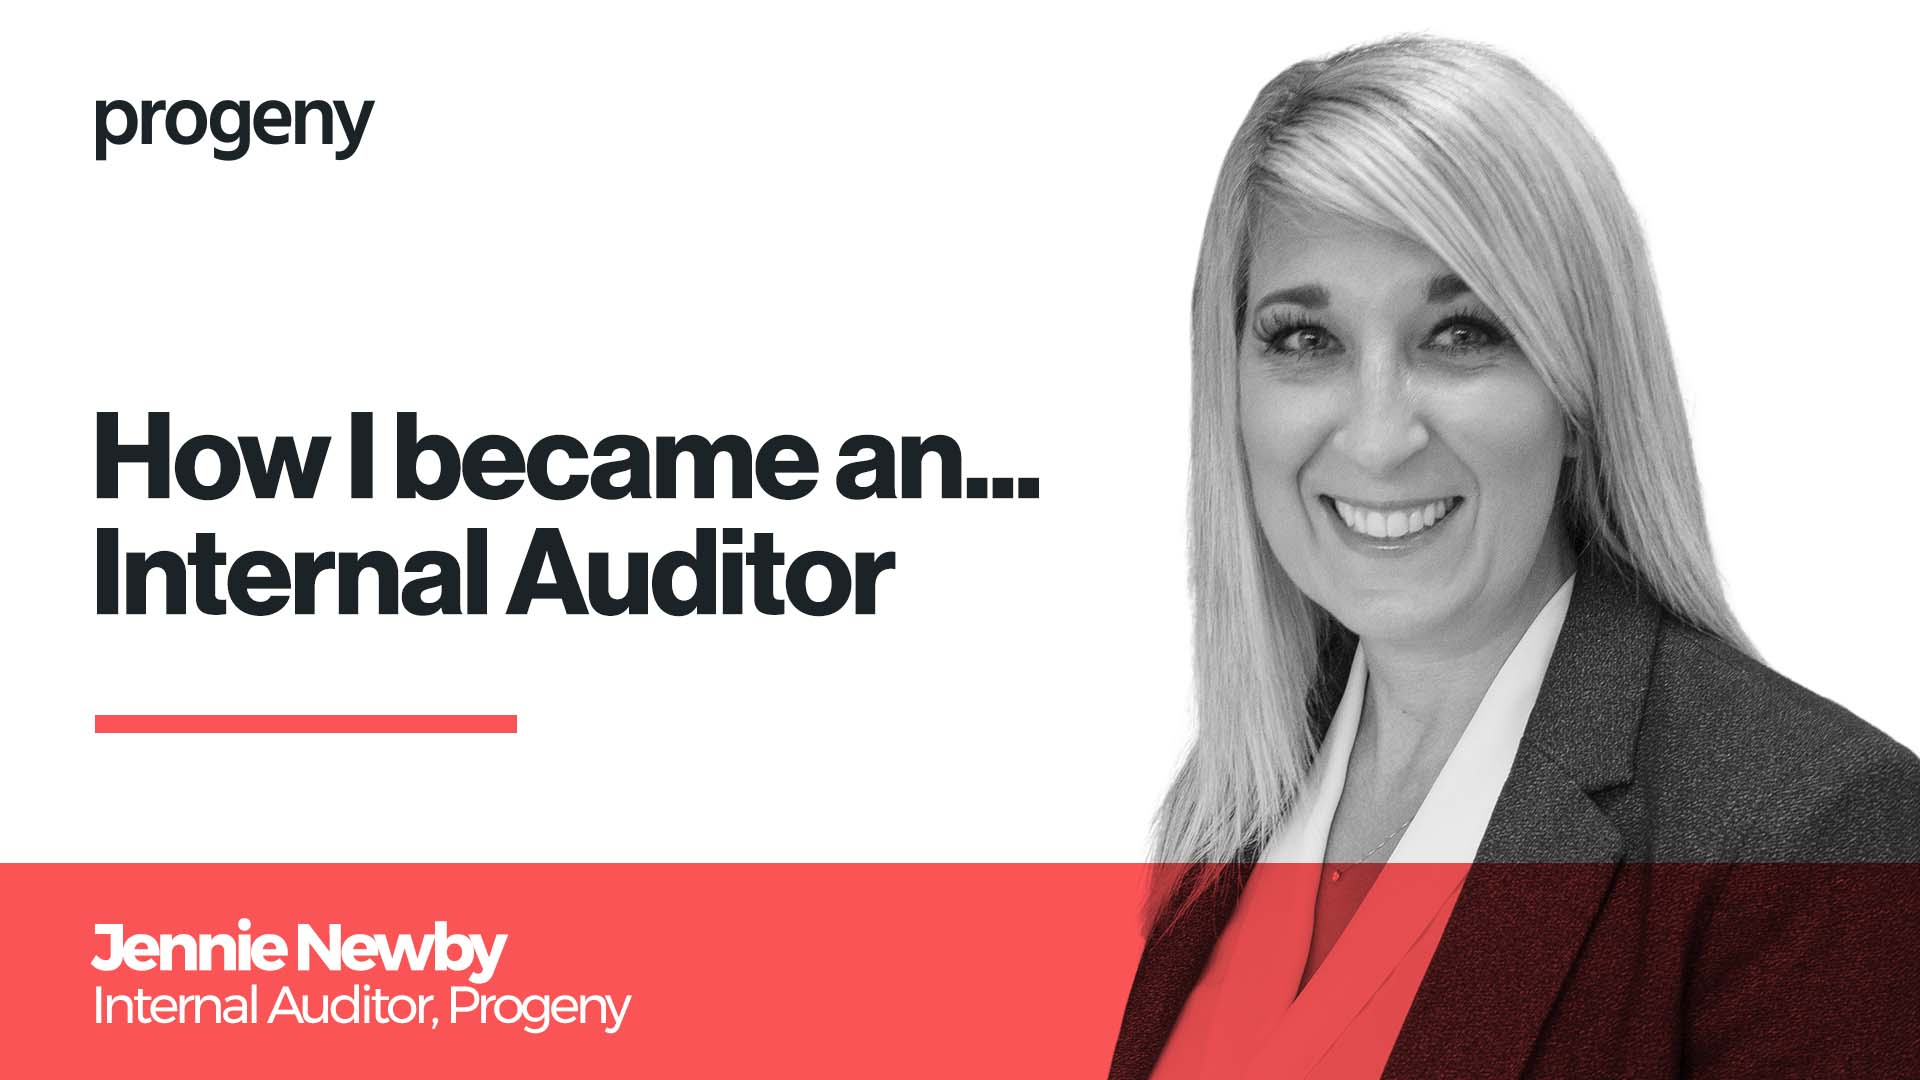 How I became an internal auditor